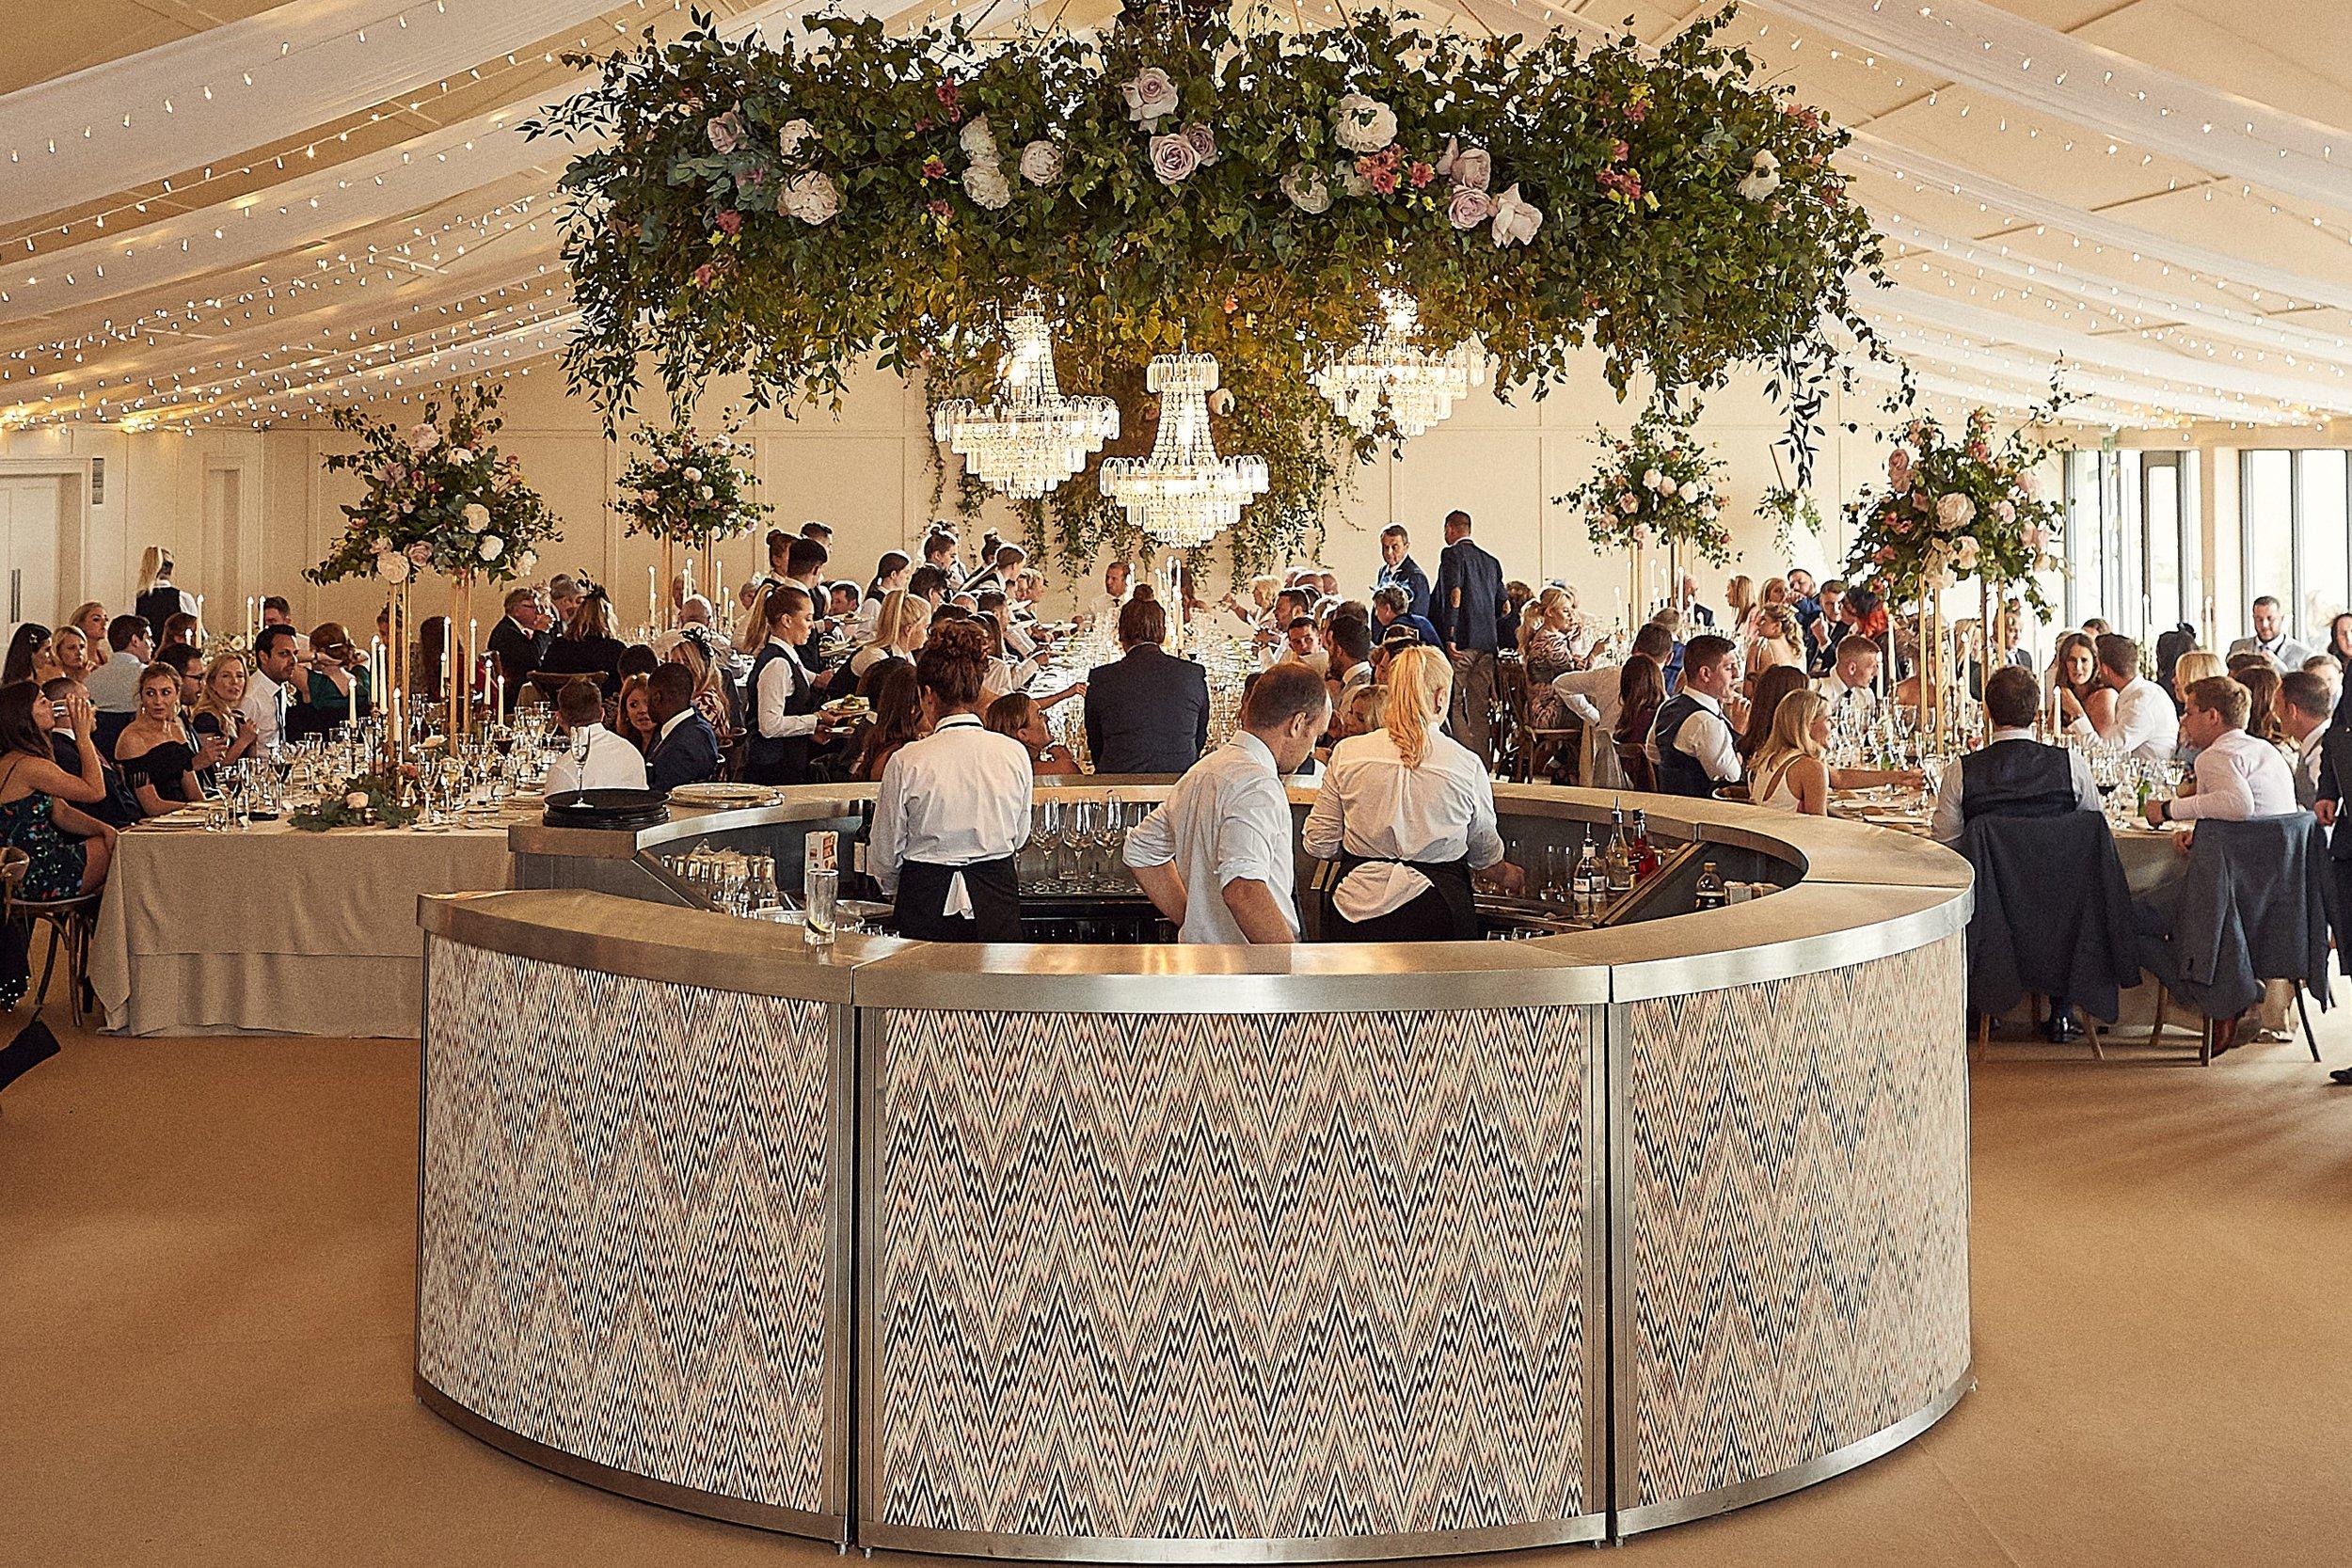 Event Management, Design & Styling 'Pocketful Of Dreams'  Floral Design- Paula Rooney